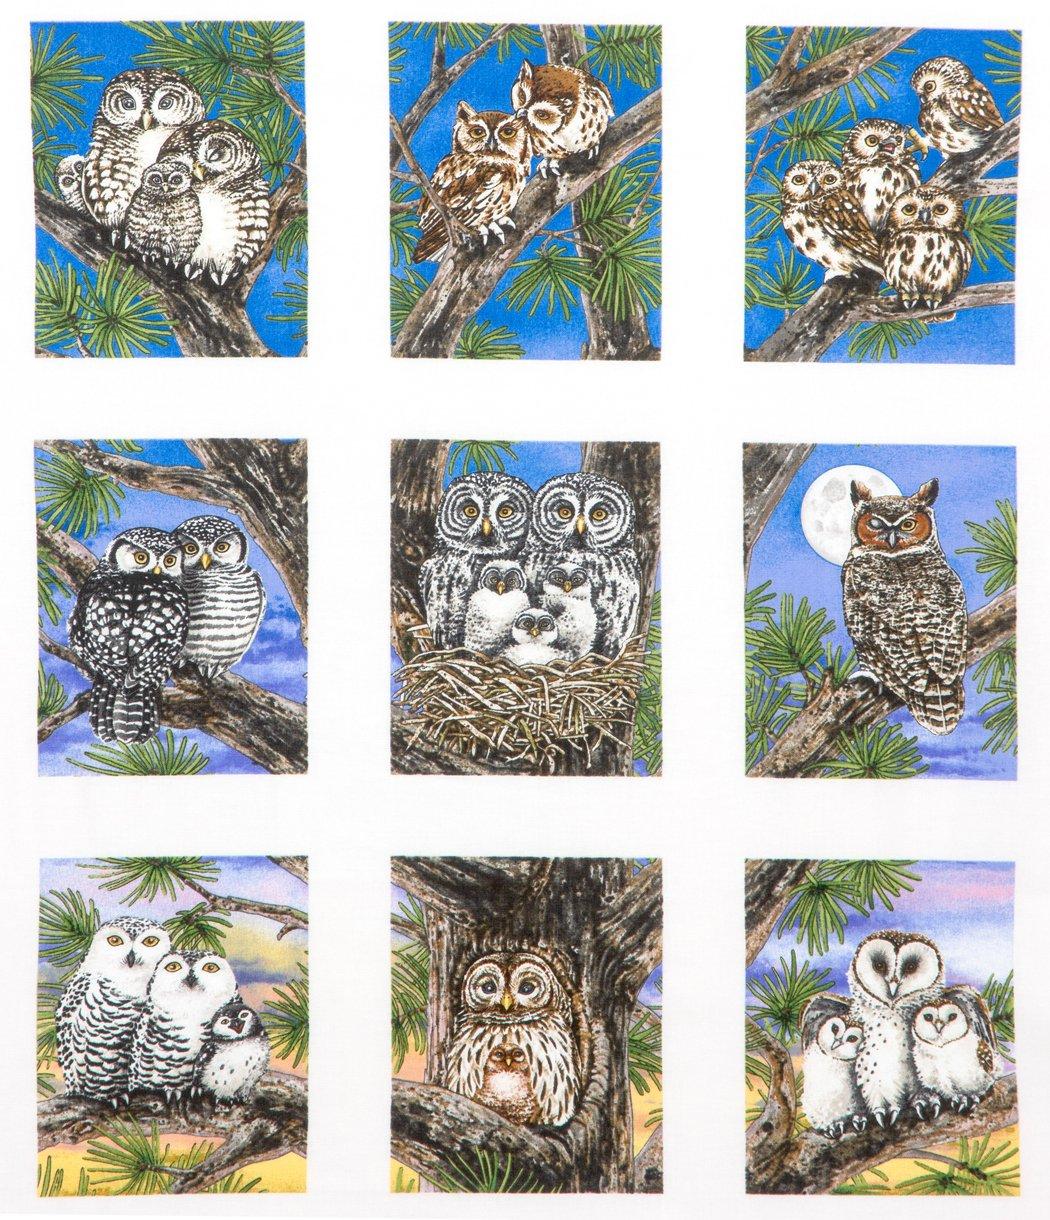 Owl Families panel